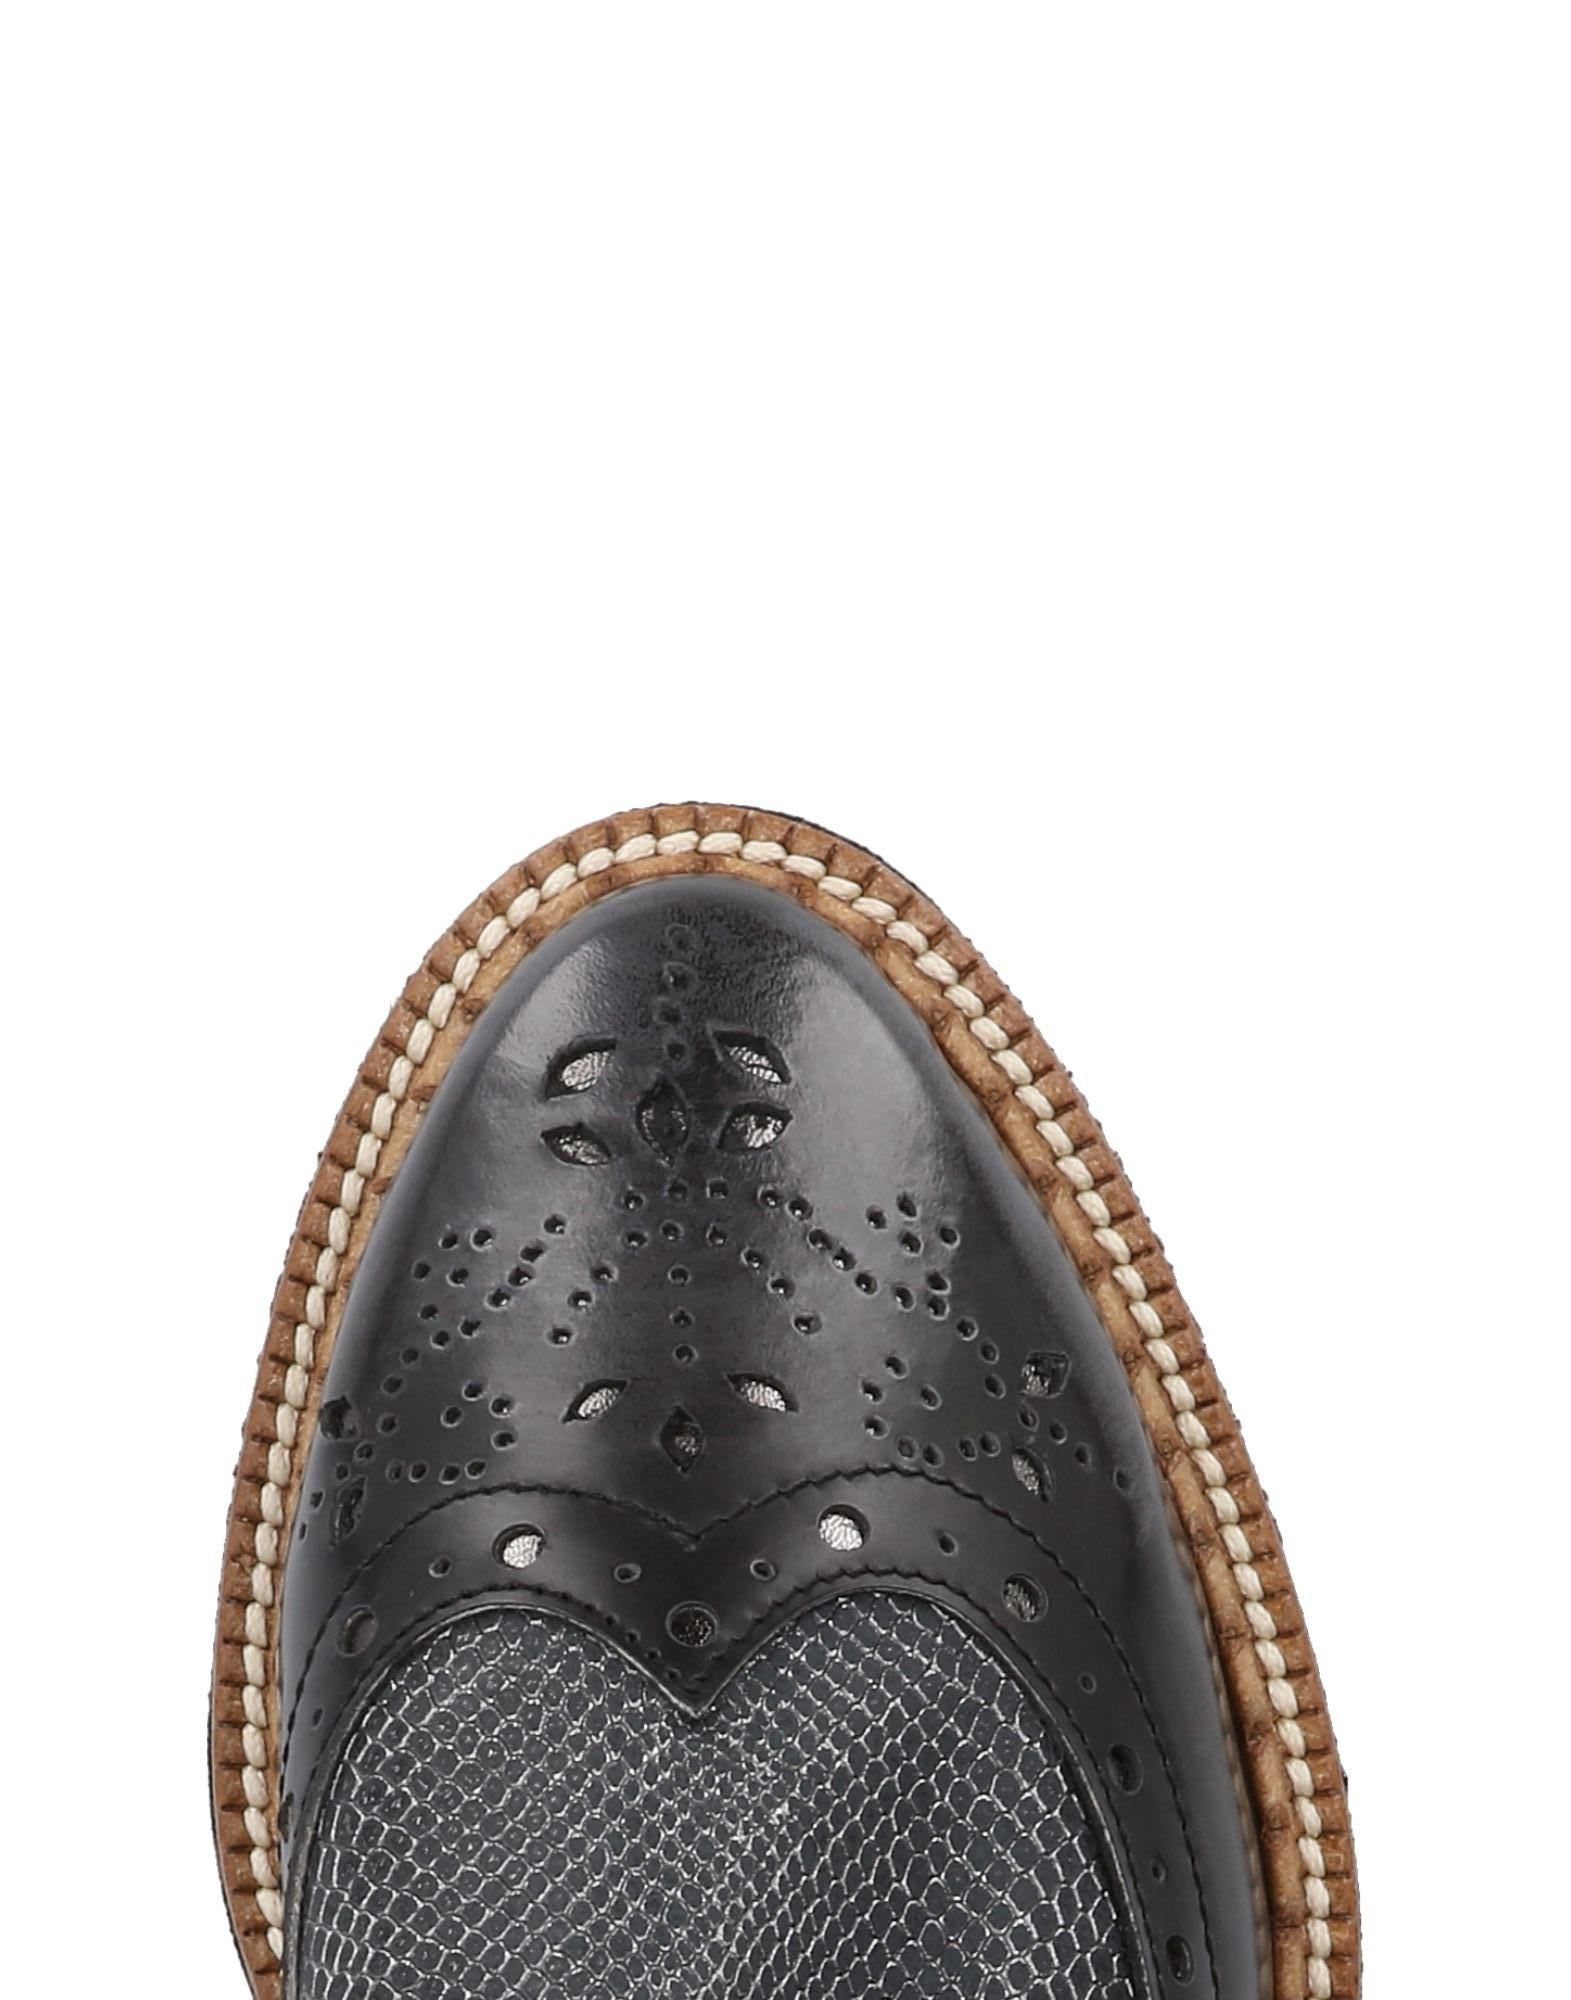 Stilvolle Mokassins billige Schuhe Antonio Marras Mokassins Stilvolle Damen  11465684CD 6763e0